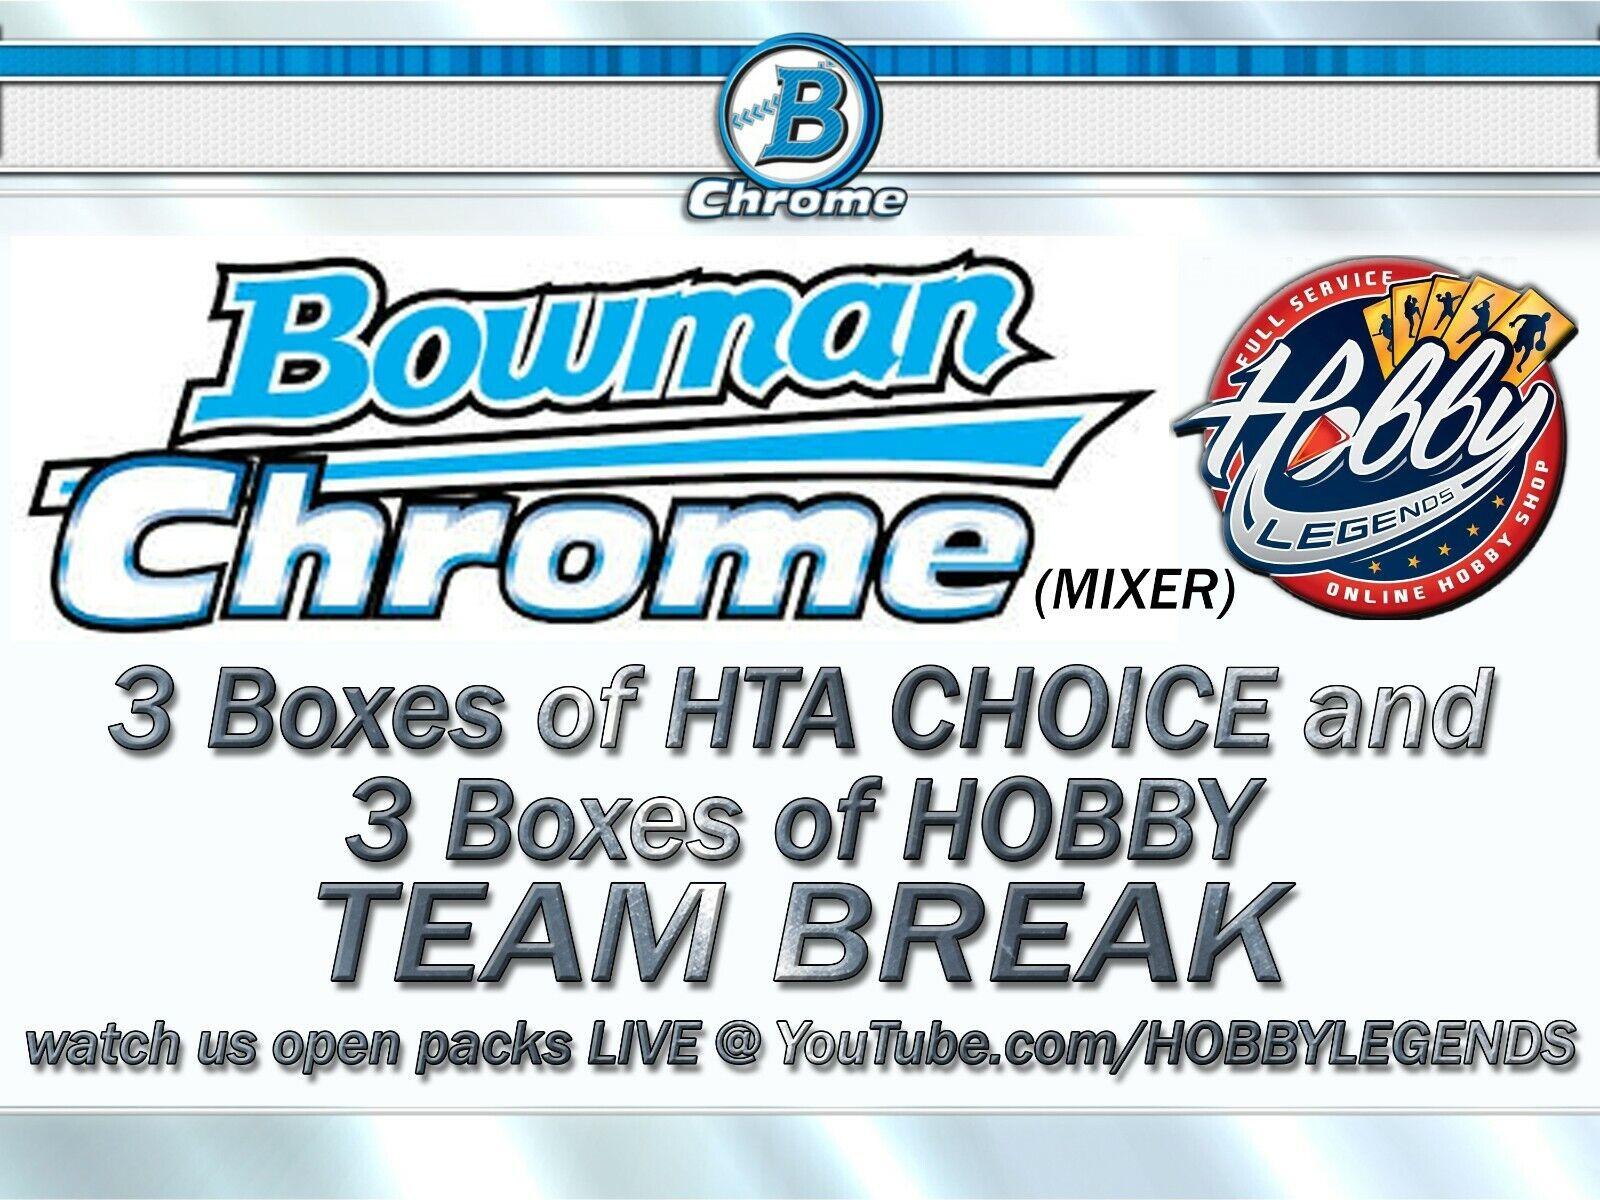 CHICAGO CUBS 2020 BOWMAN CHROME 6 BOX MIX 3 HTA 3 HOBBY TEAM BREAK 39 - $32.00